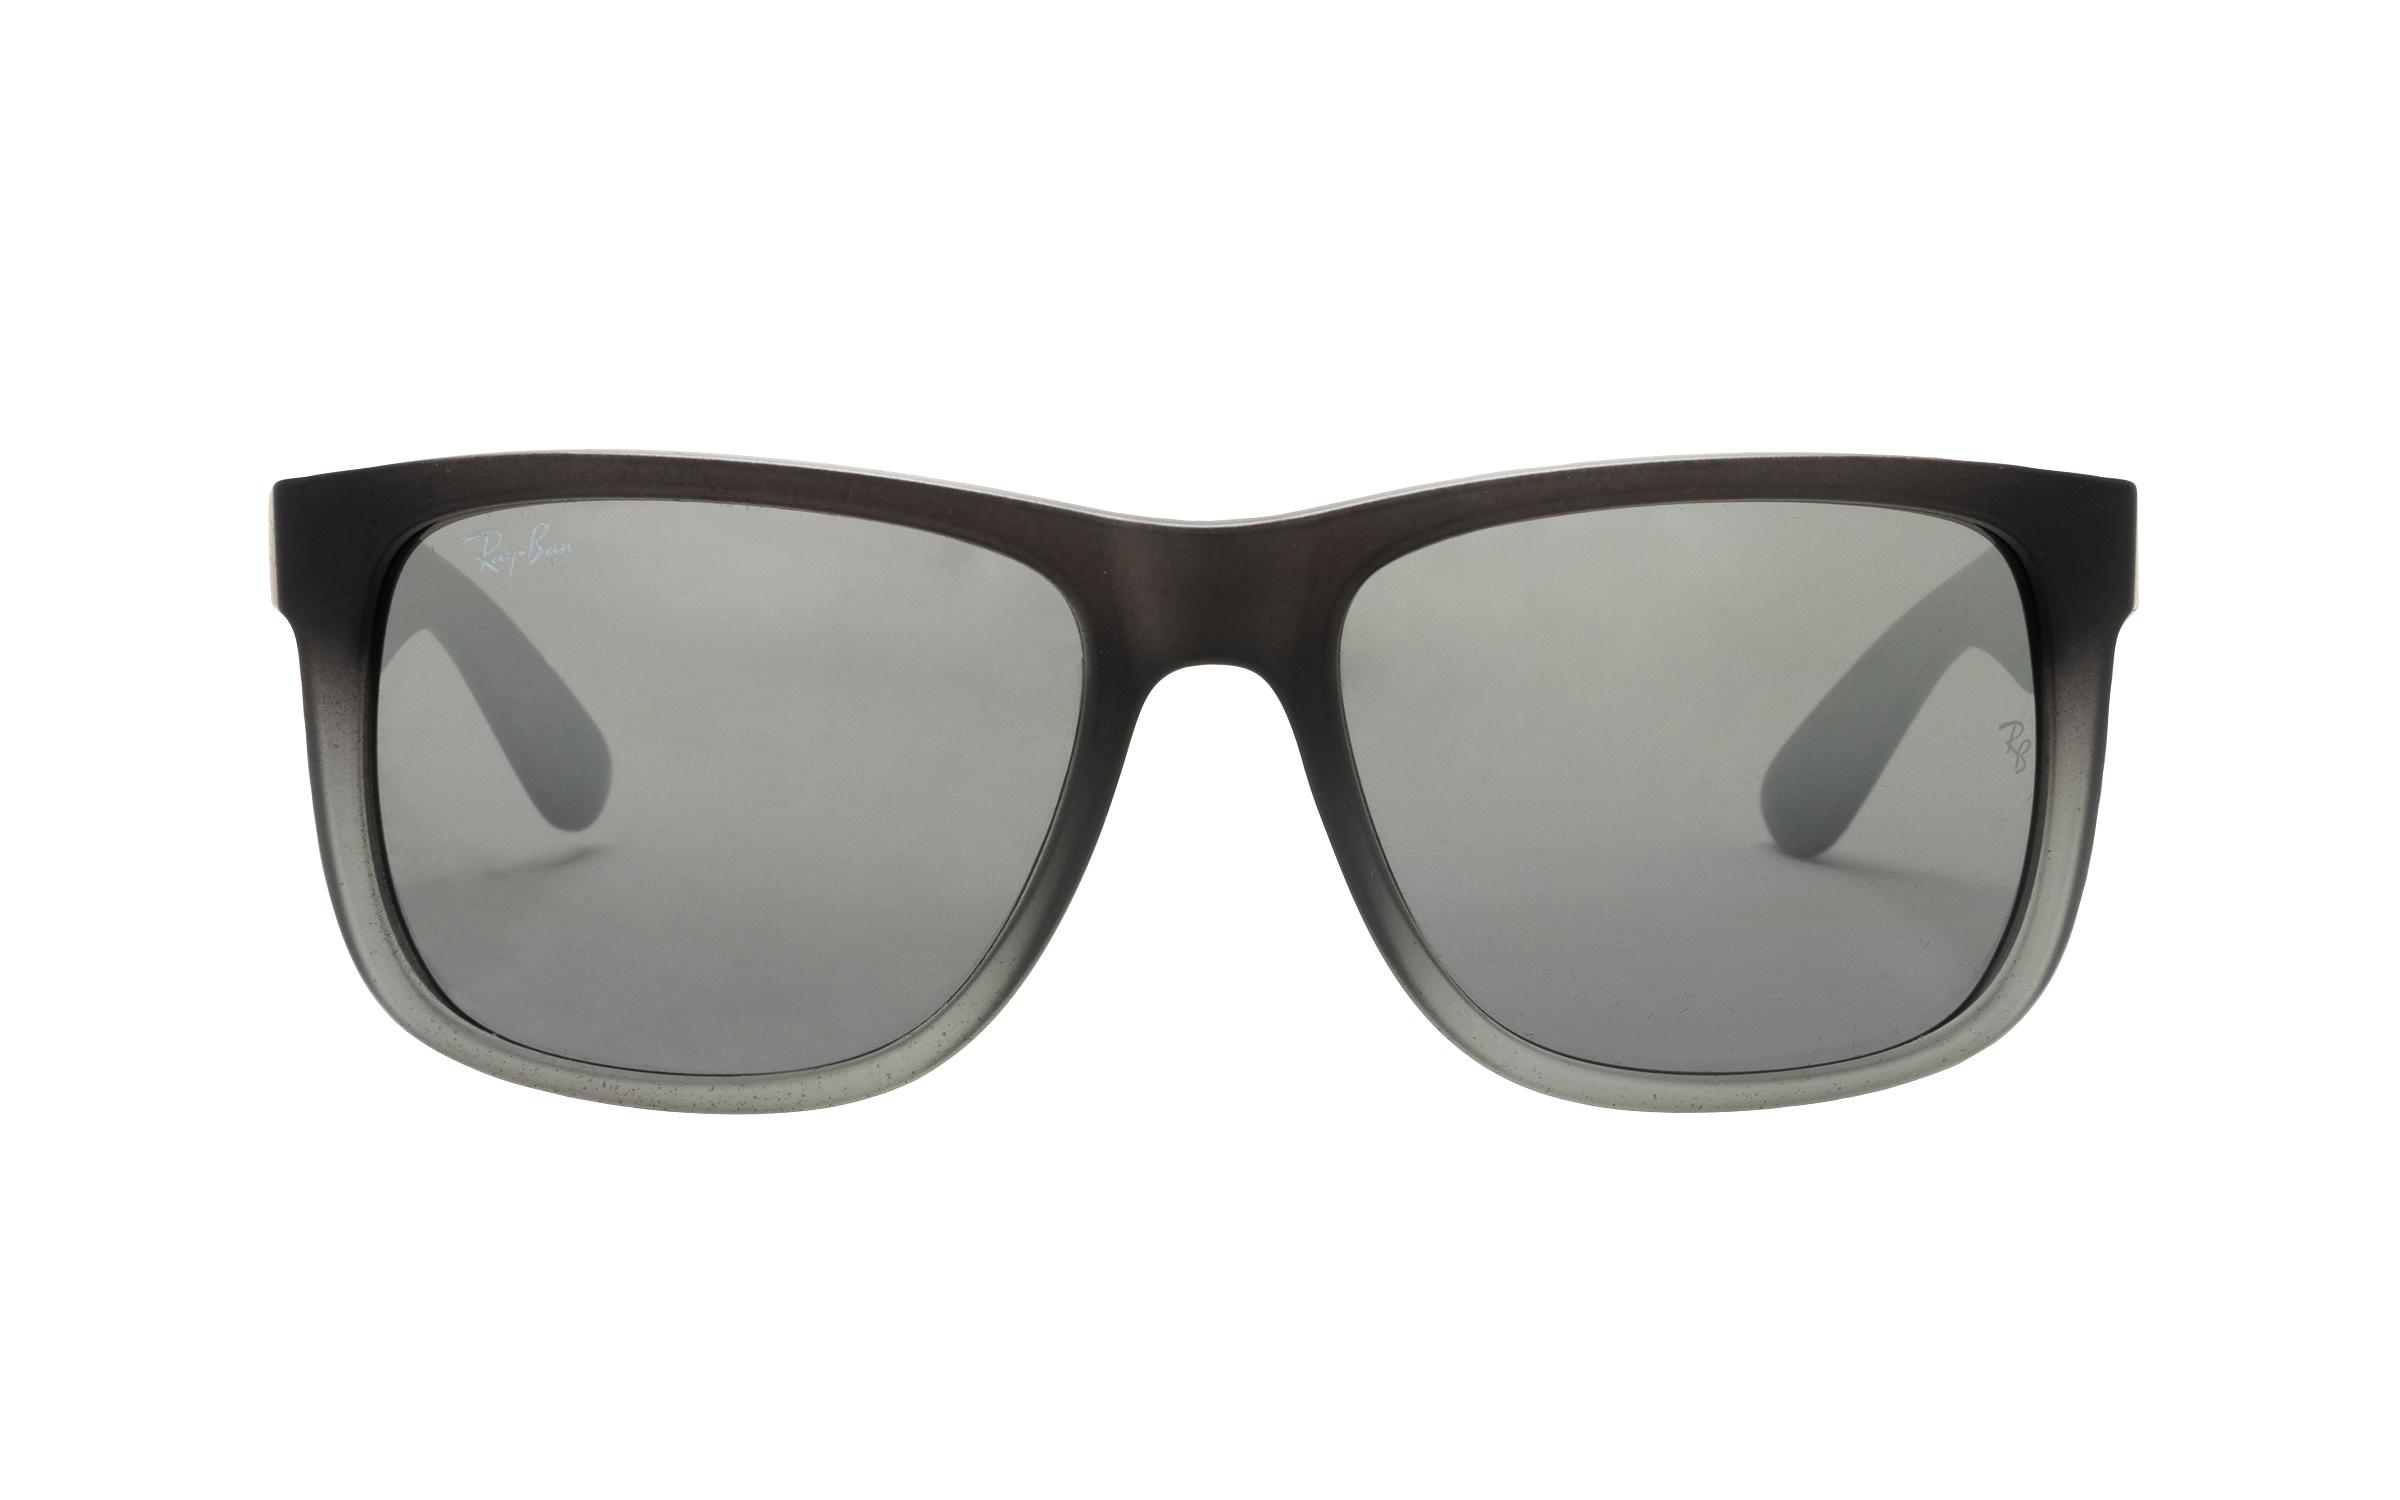 coastal.com - RayBan Ray-Ban RB4165 852/88 Rubber Grey/Grey Transp 55 Sunglasses – Online Coastal 144.00 USD